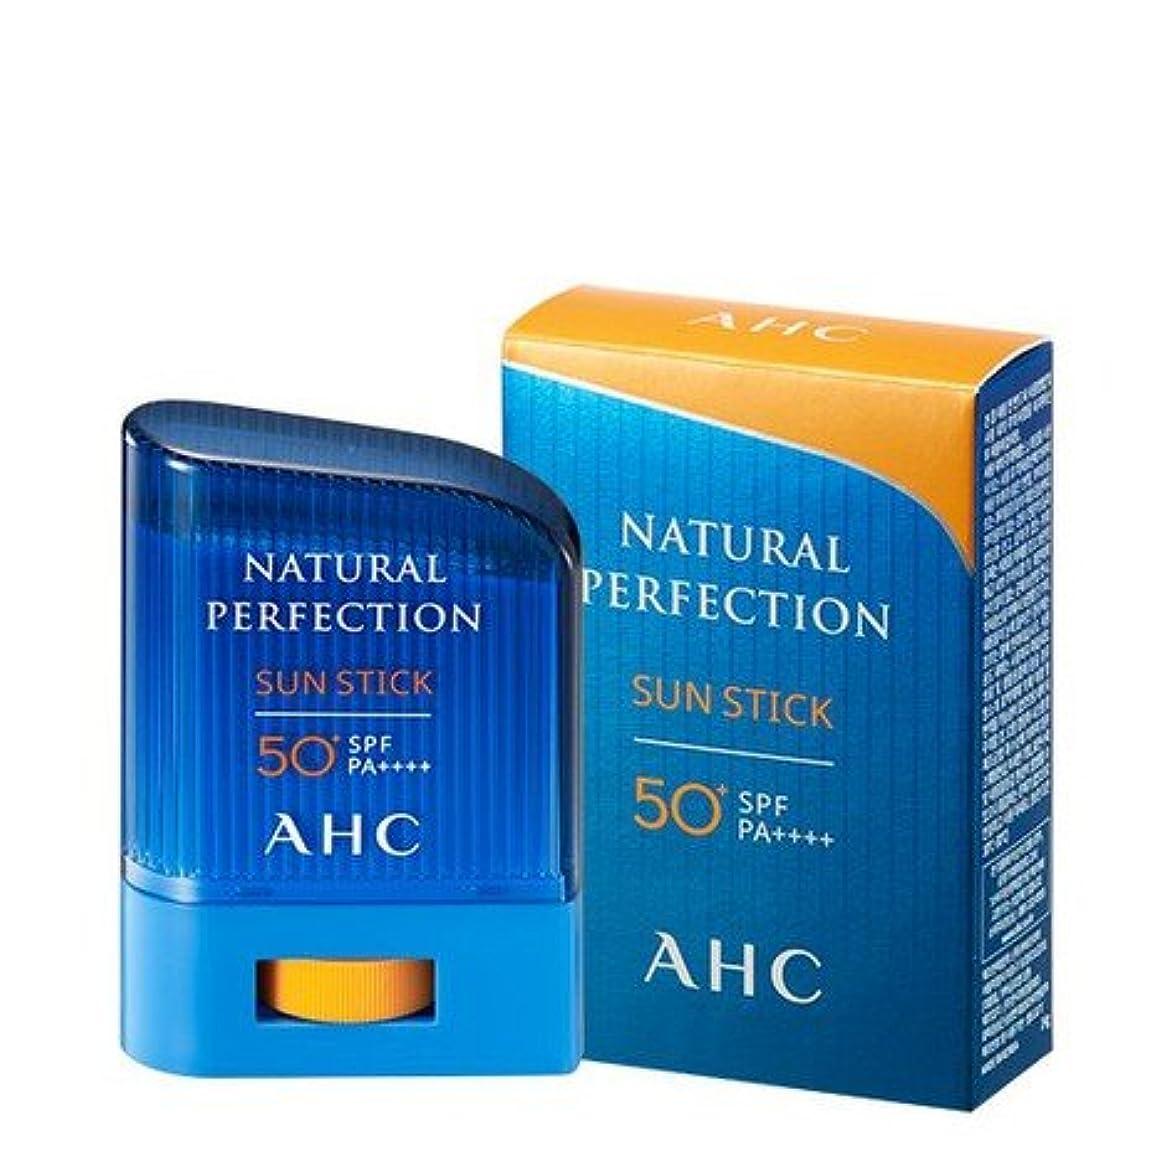 [Renewal 最新] AHCナチュラルパーフェクション線スティック / AHC NATURAL PERFECTION SUN STICK [SPF 50+ / PA ++++] [並行輸入品] (22g)